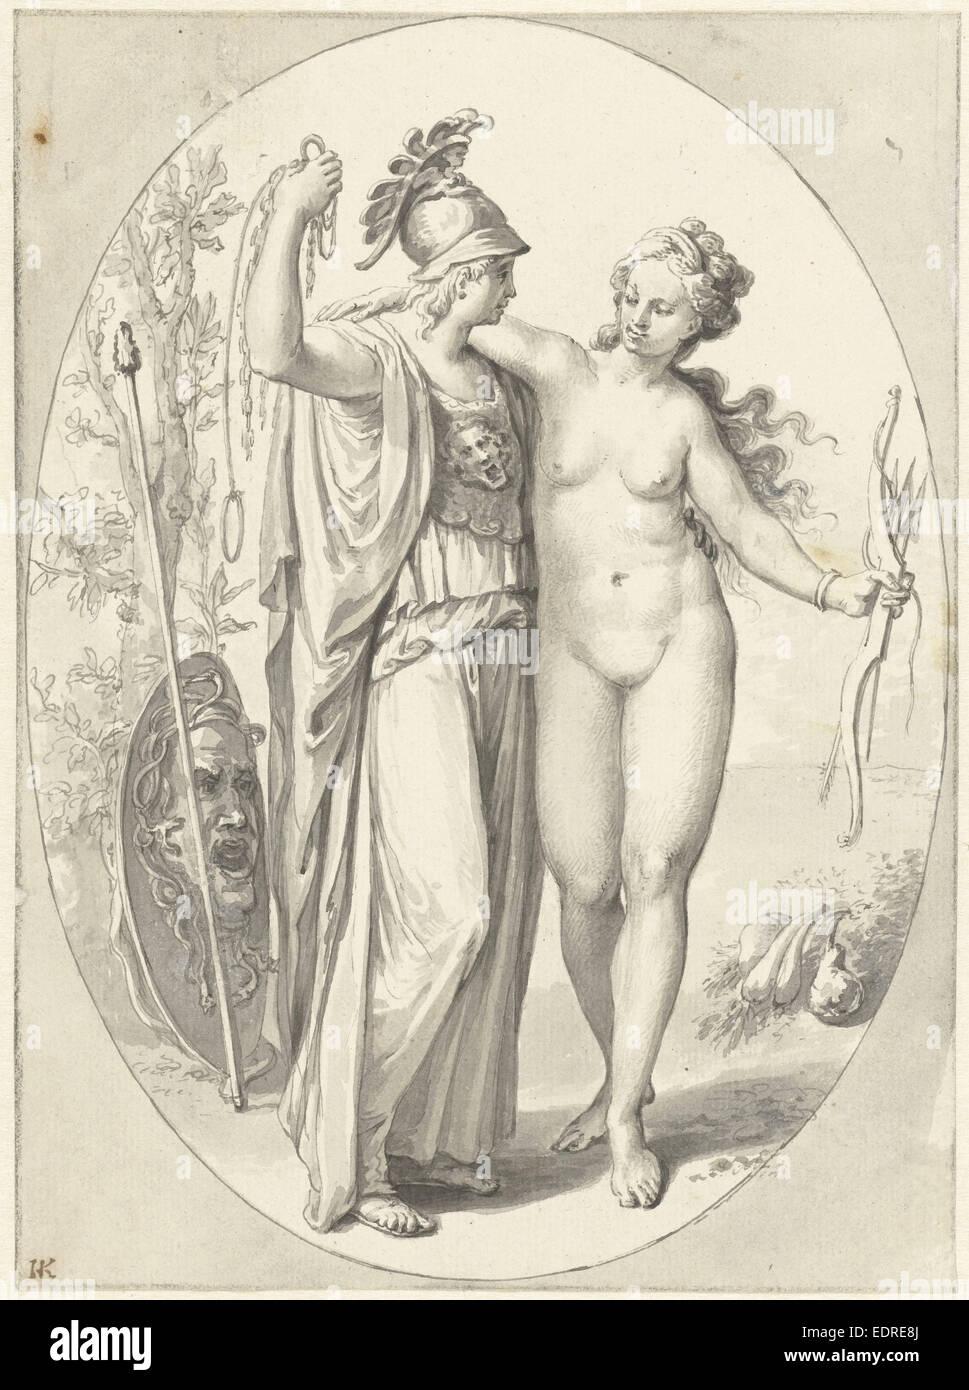 Minerva and Venus, Anonymous, 1700 - 1800 - Stock Image